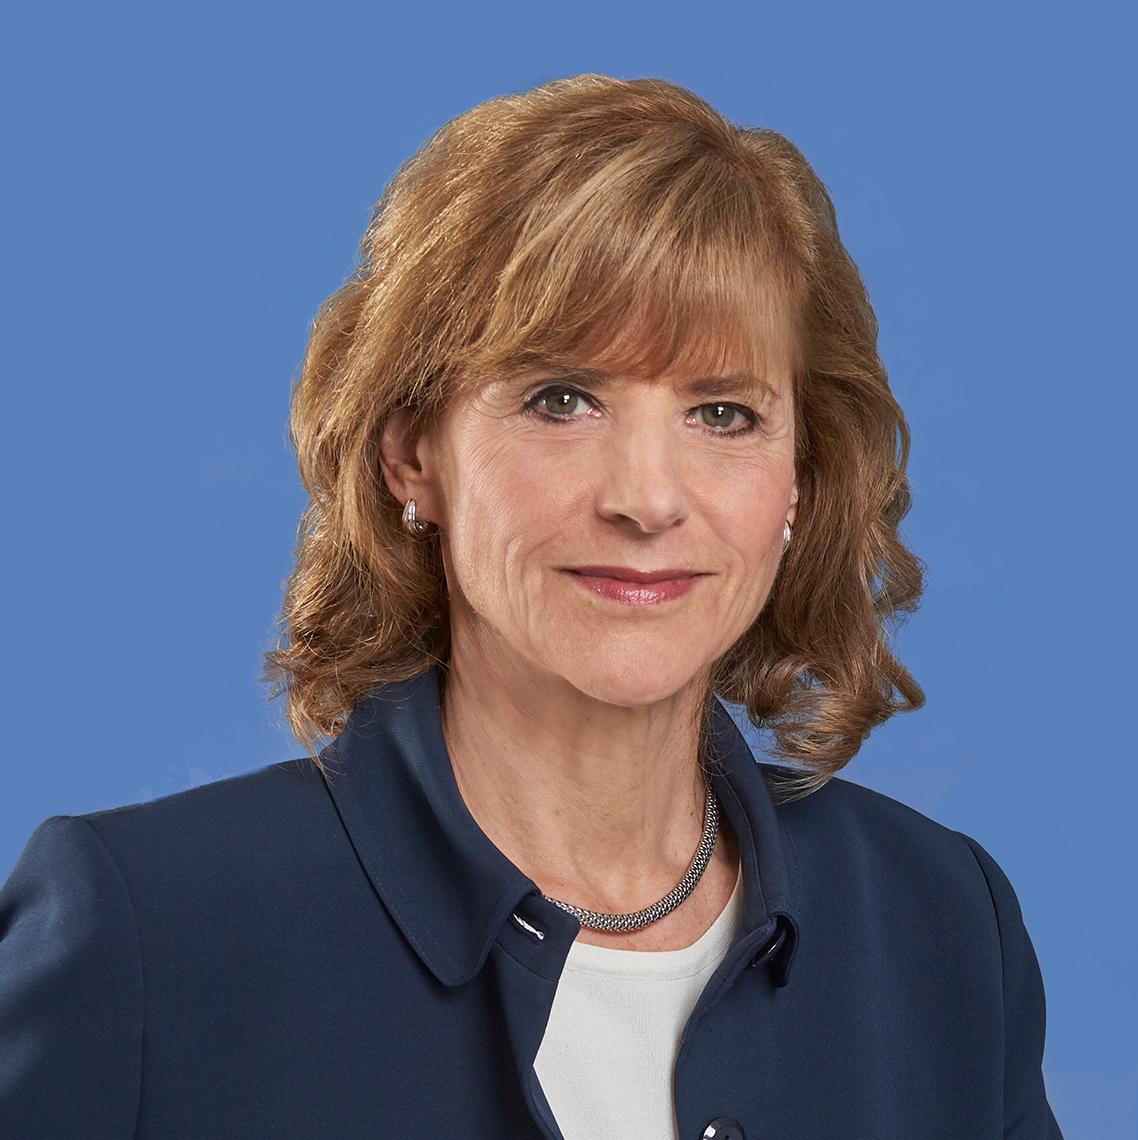 Jill Pepall